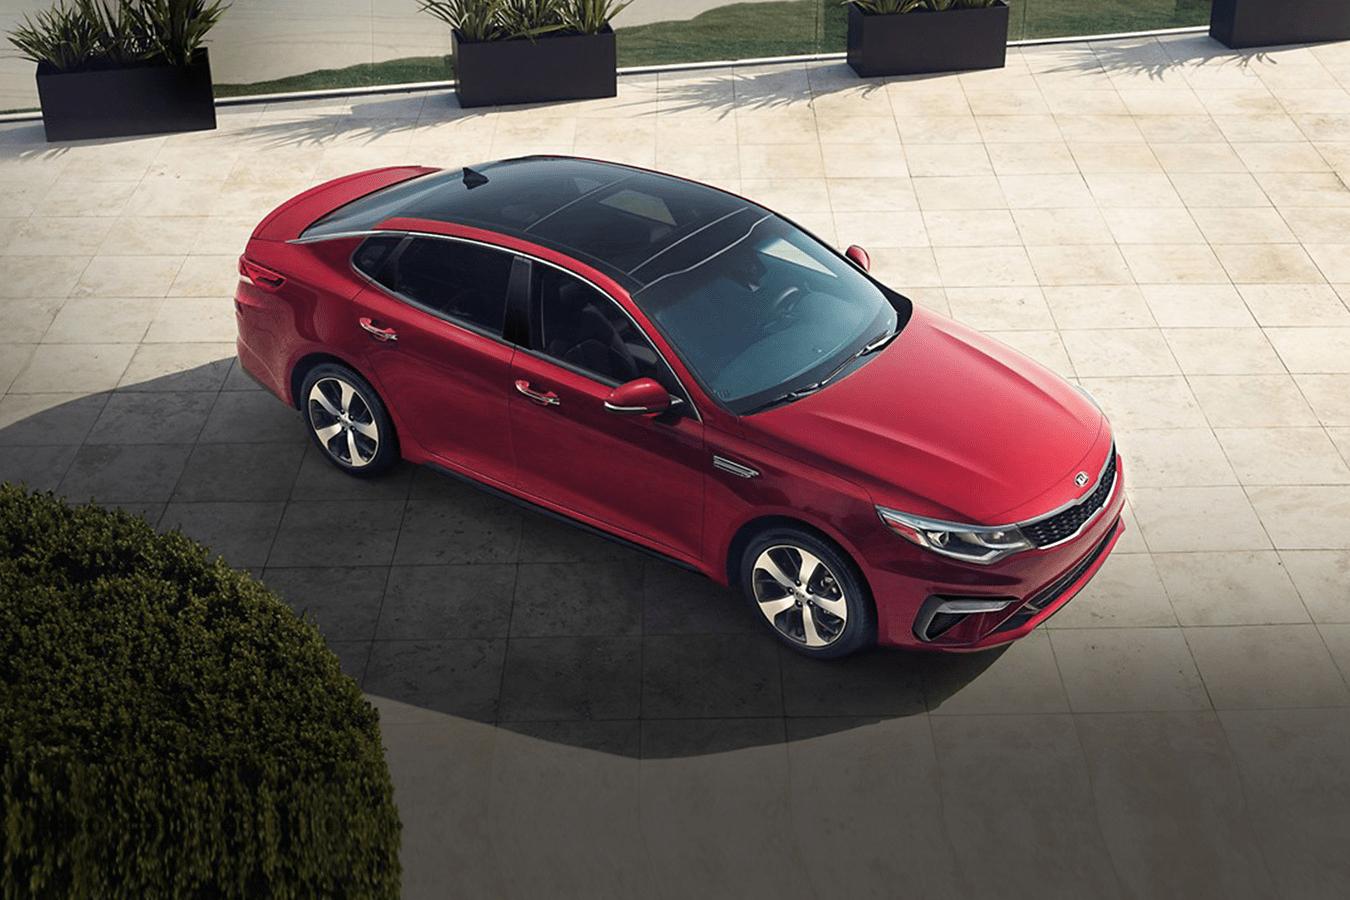 2019 Kia Optima exterior in red